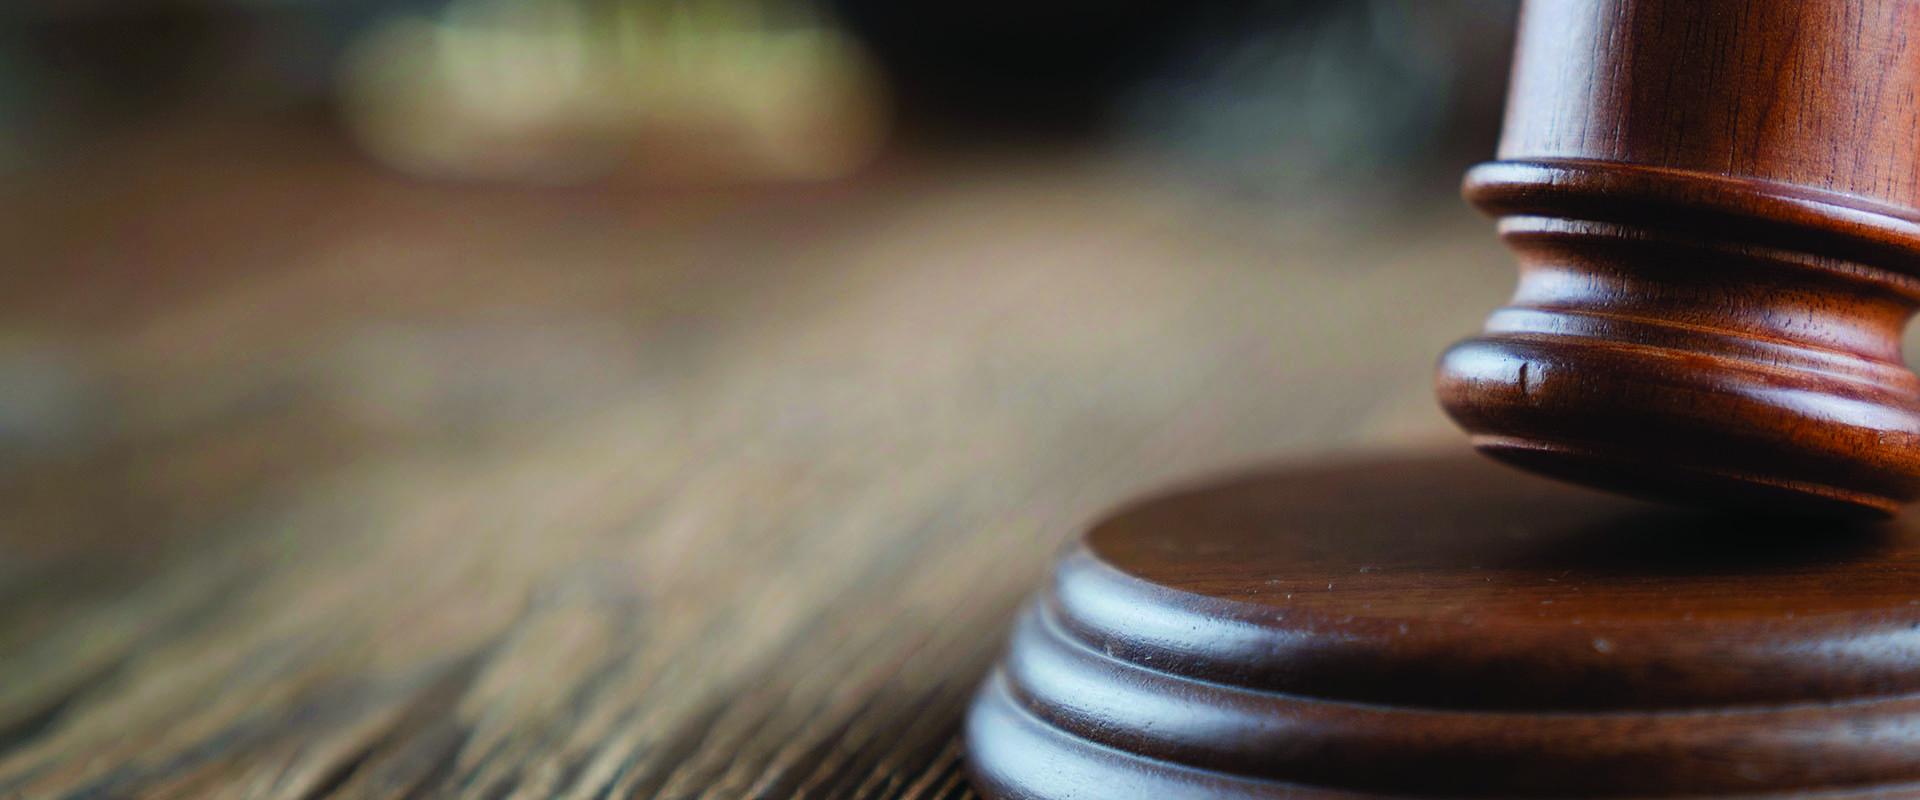 Plaintiff Verdict in Clay County, MO, Medical Malpractice Case